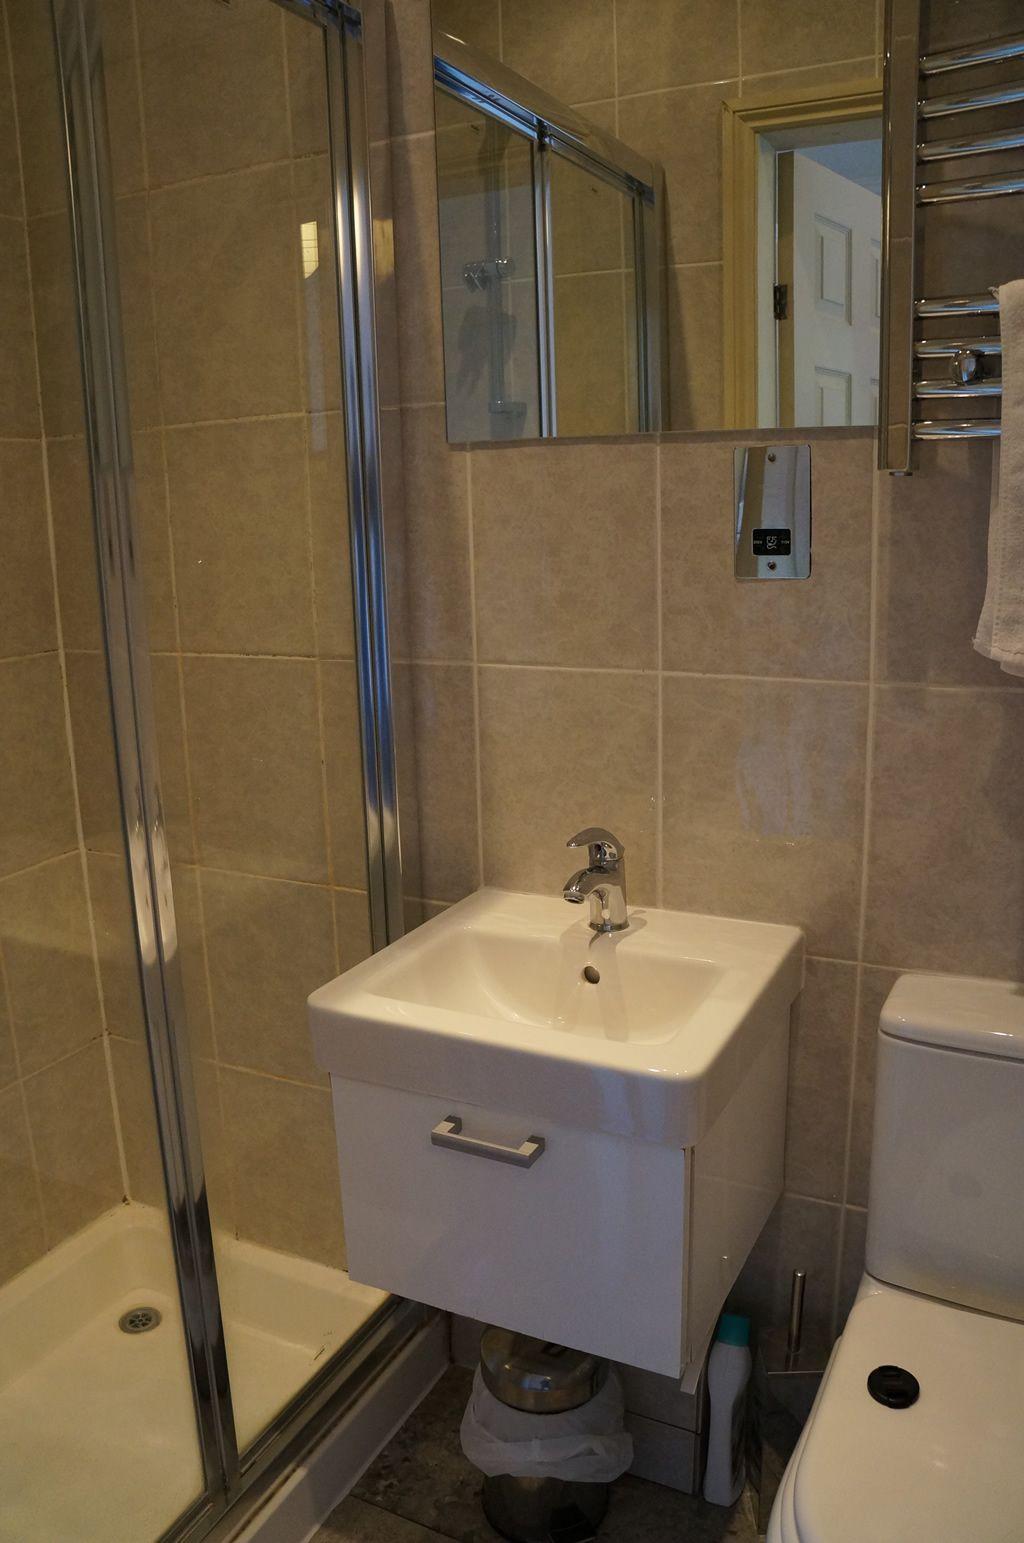 Master bedroom ensuite  ensuite bathroom  Google Search  bathrooms  Pinterest  Ensuite